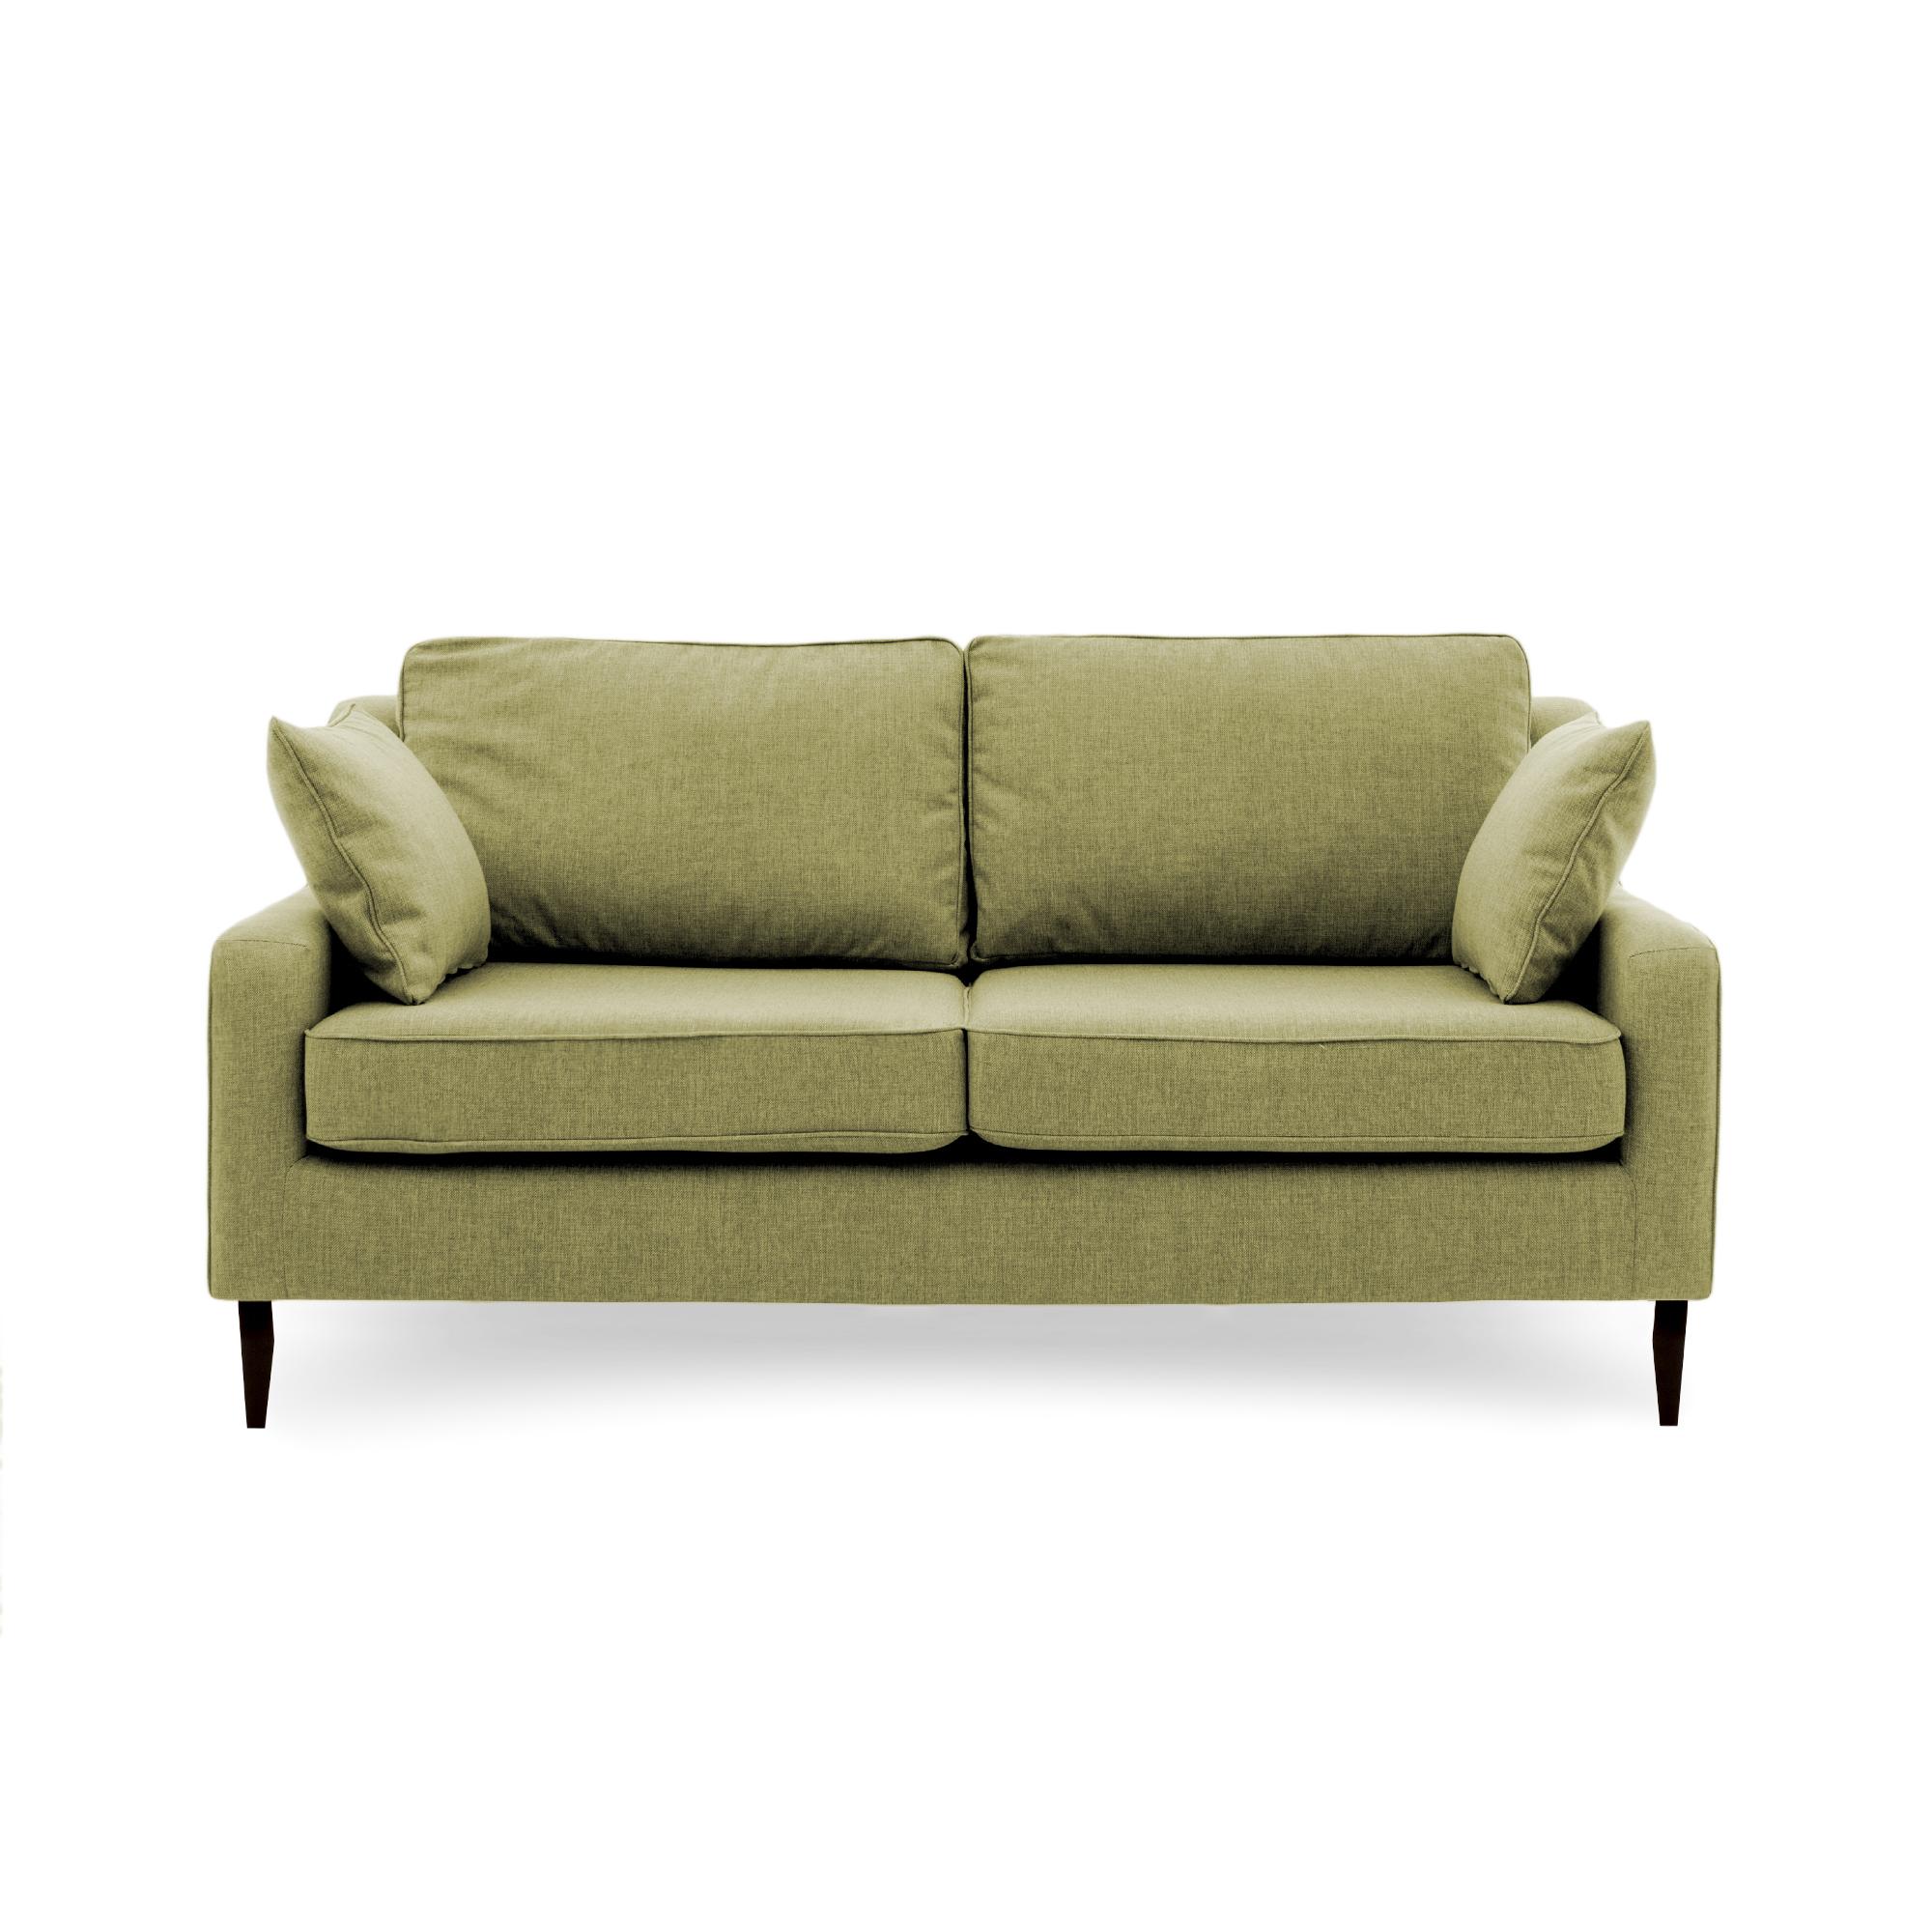 Canapea Fixa 3 locuri Bond Green